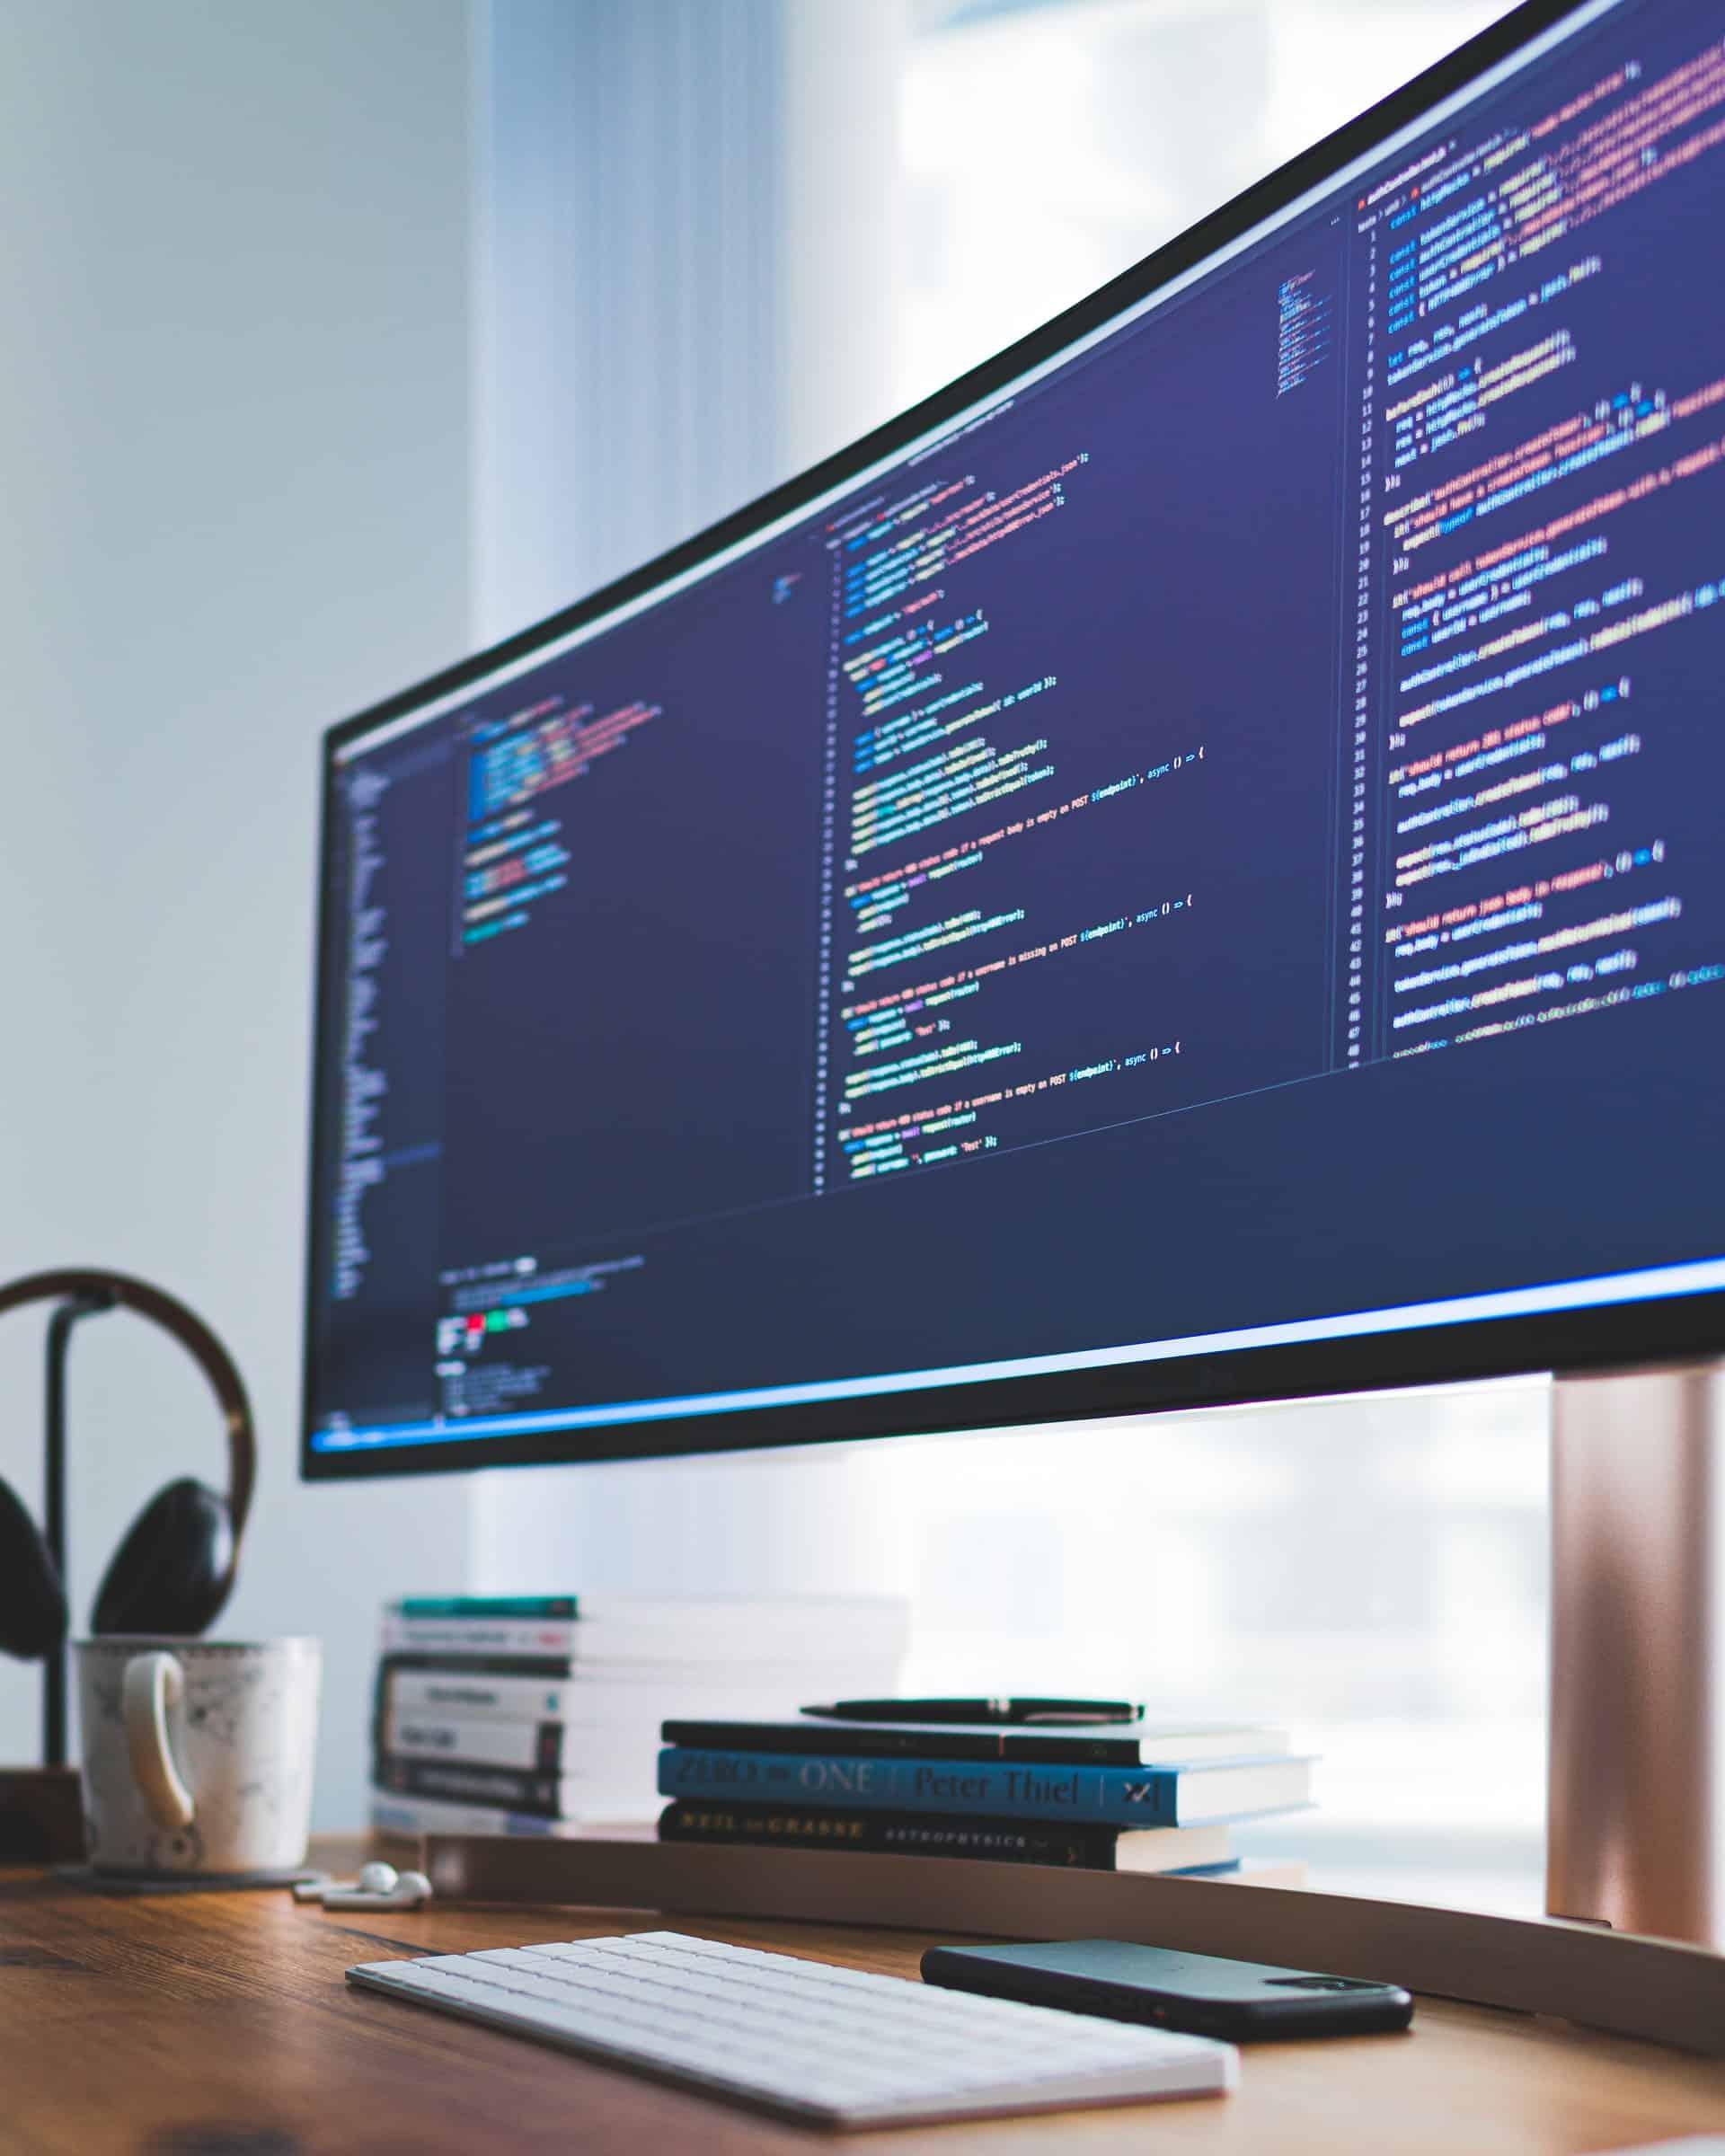 Software Development Trends 2020 Article Image